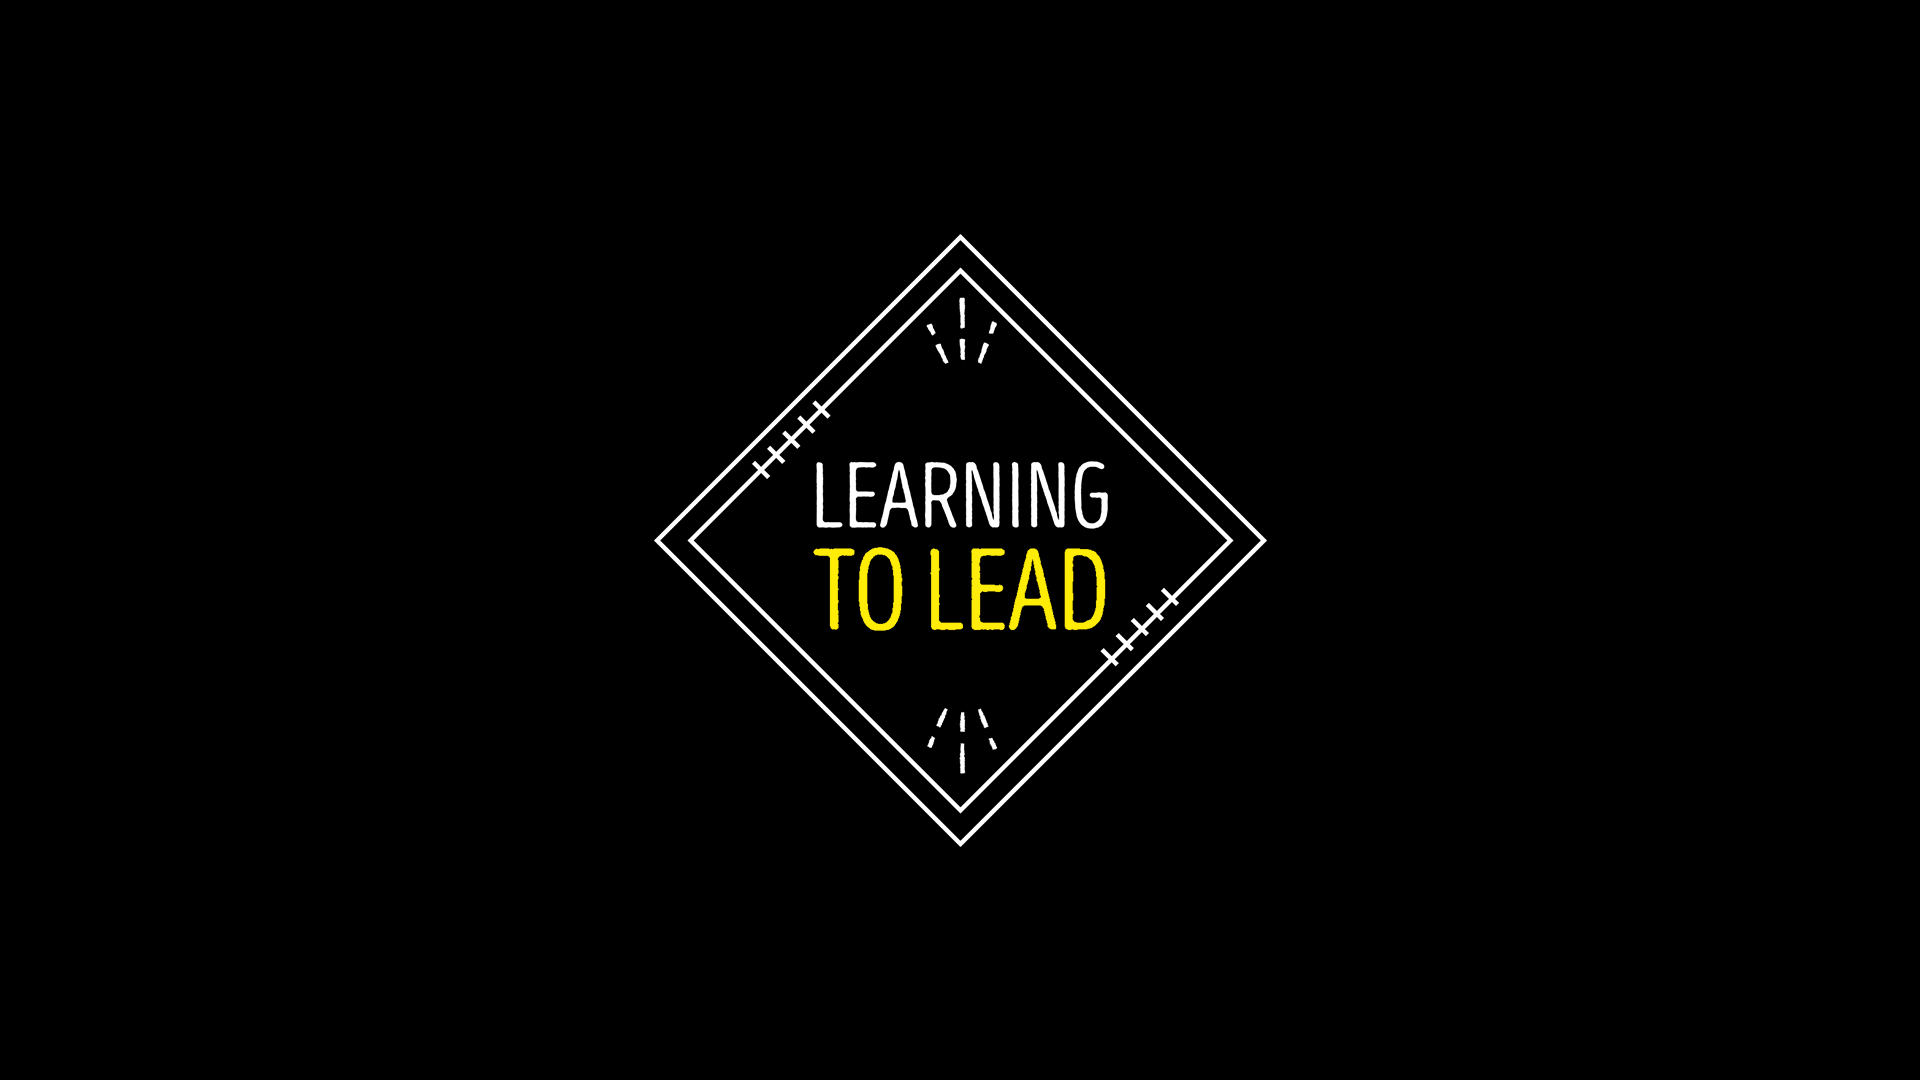 learningtolead.jpg